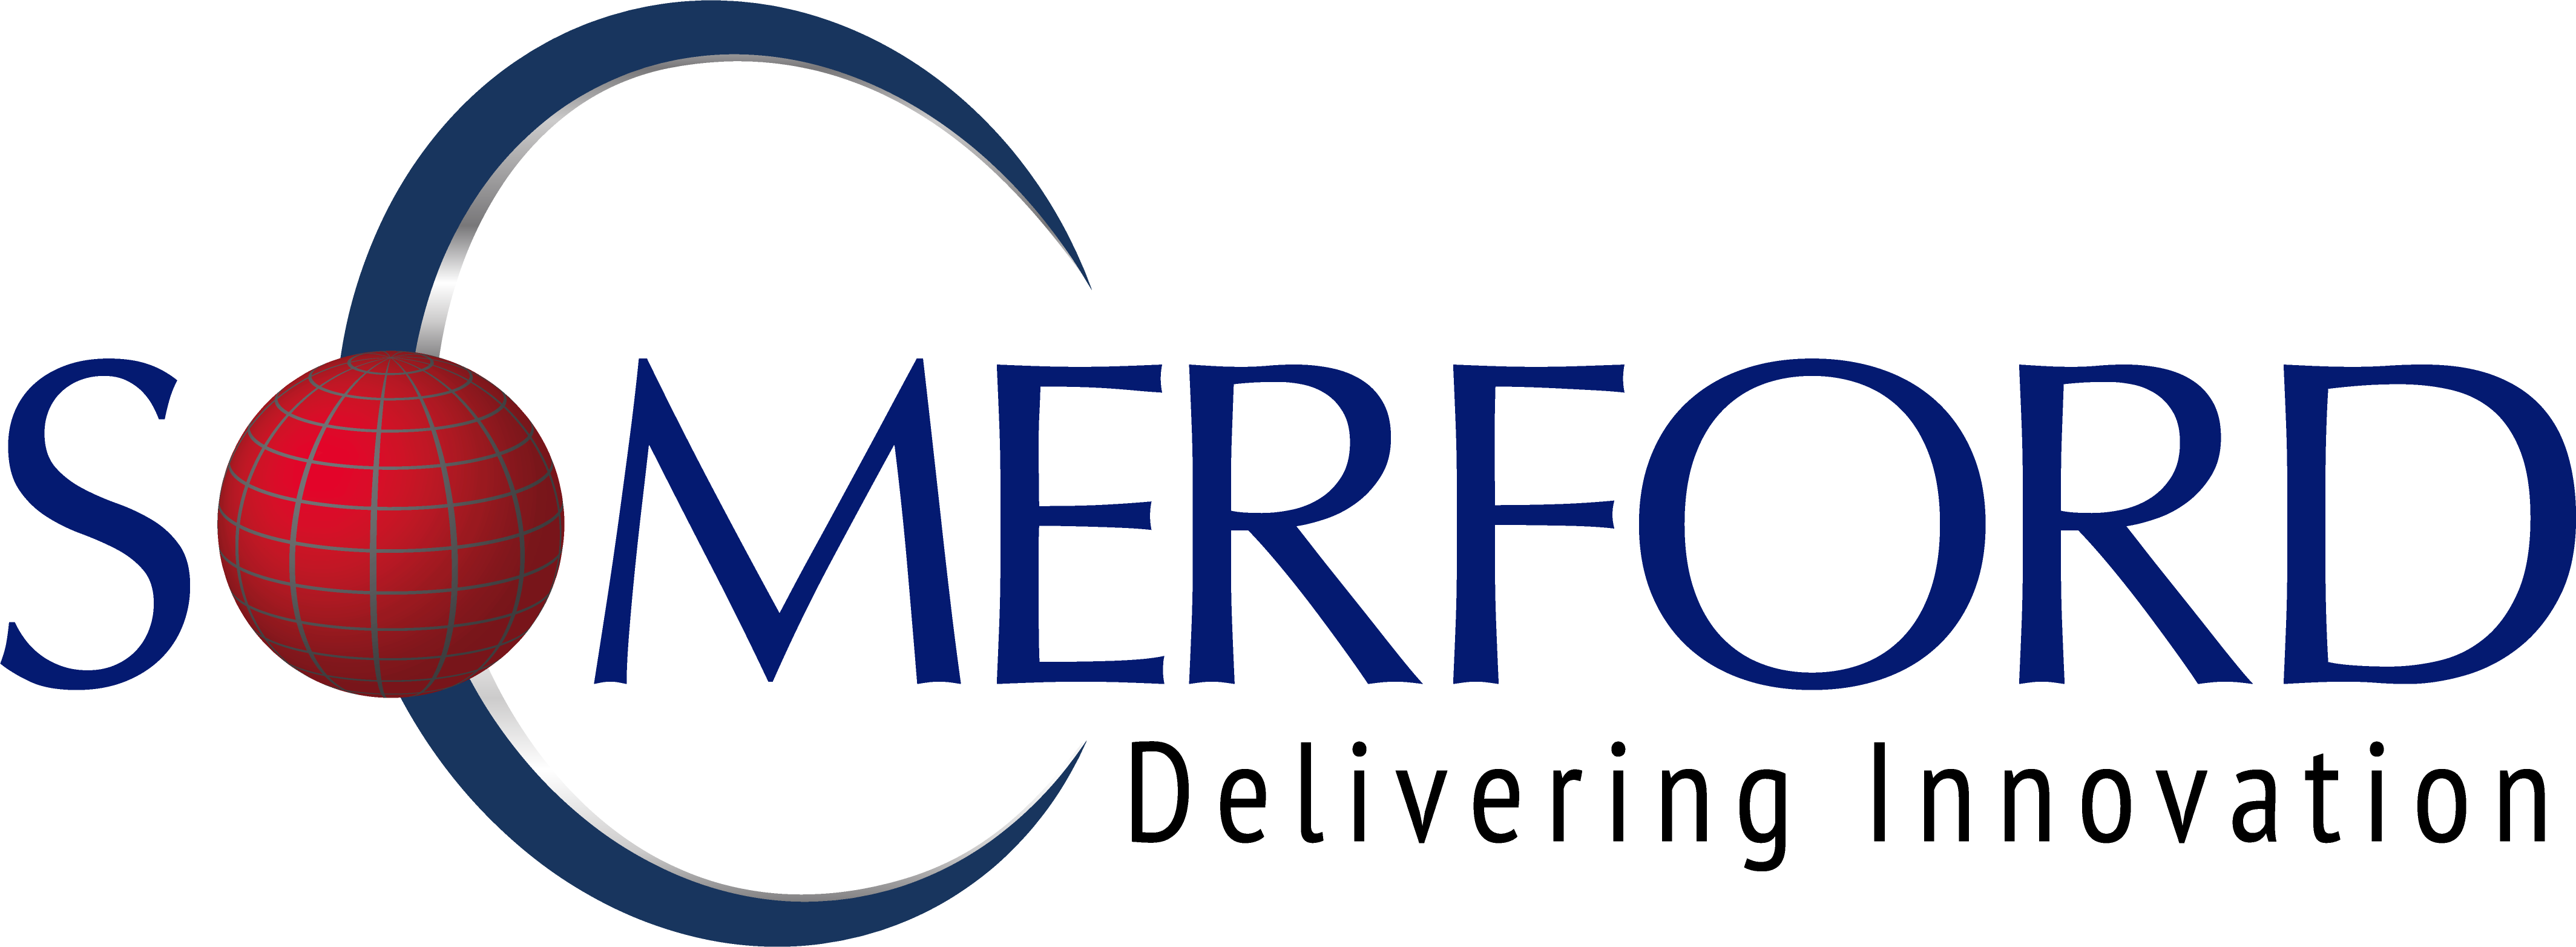 Somerford Associates Logo